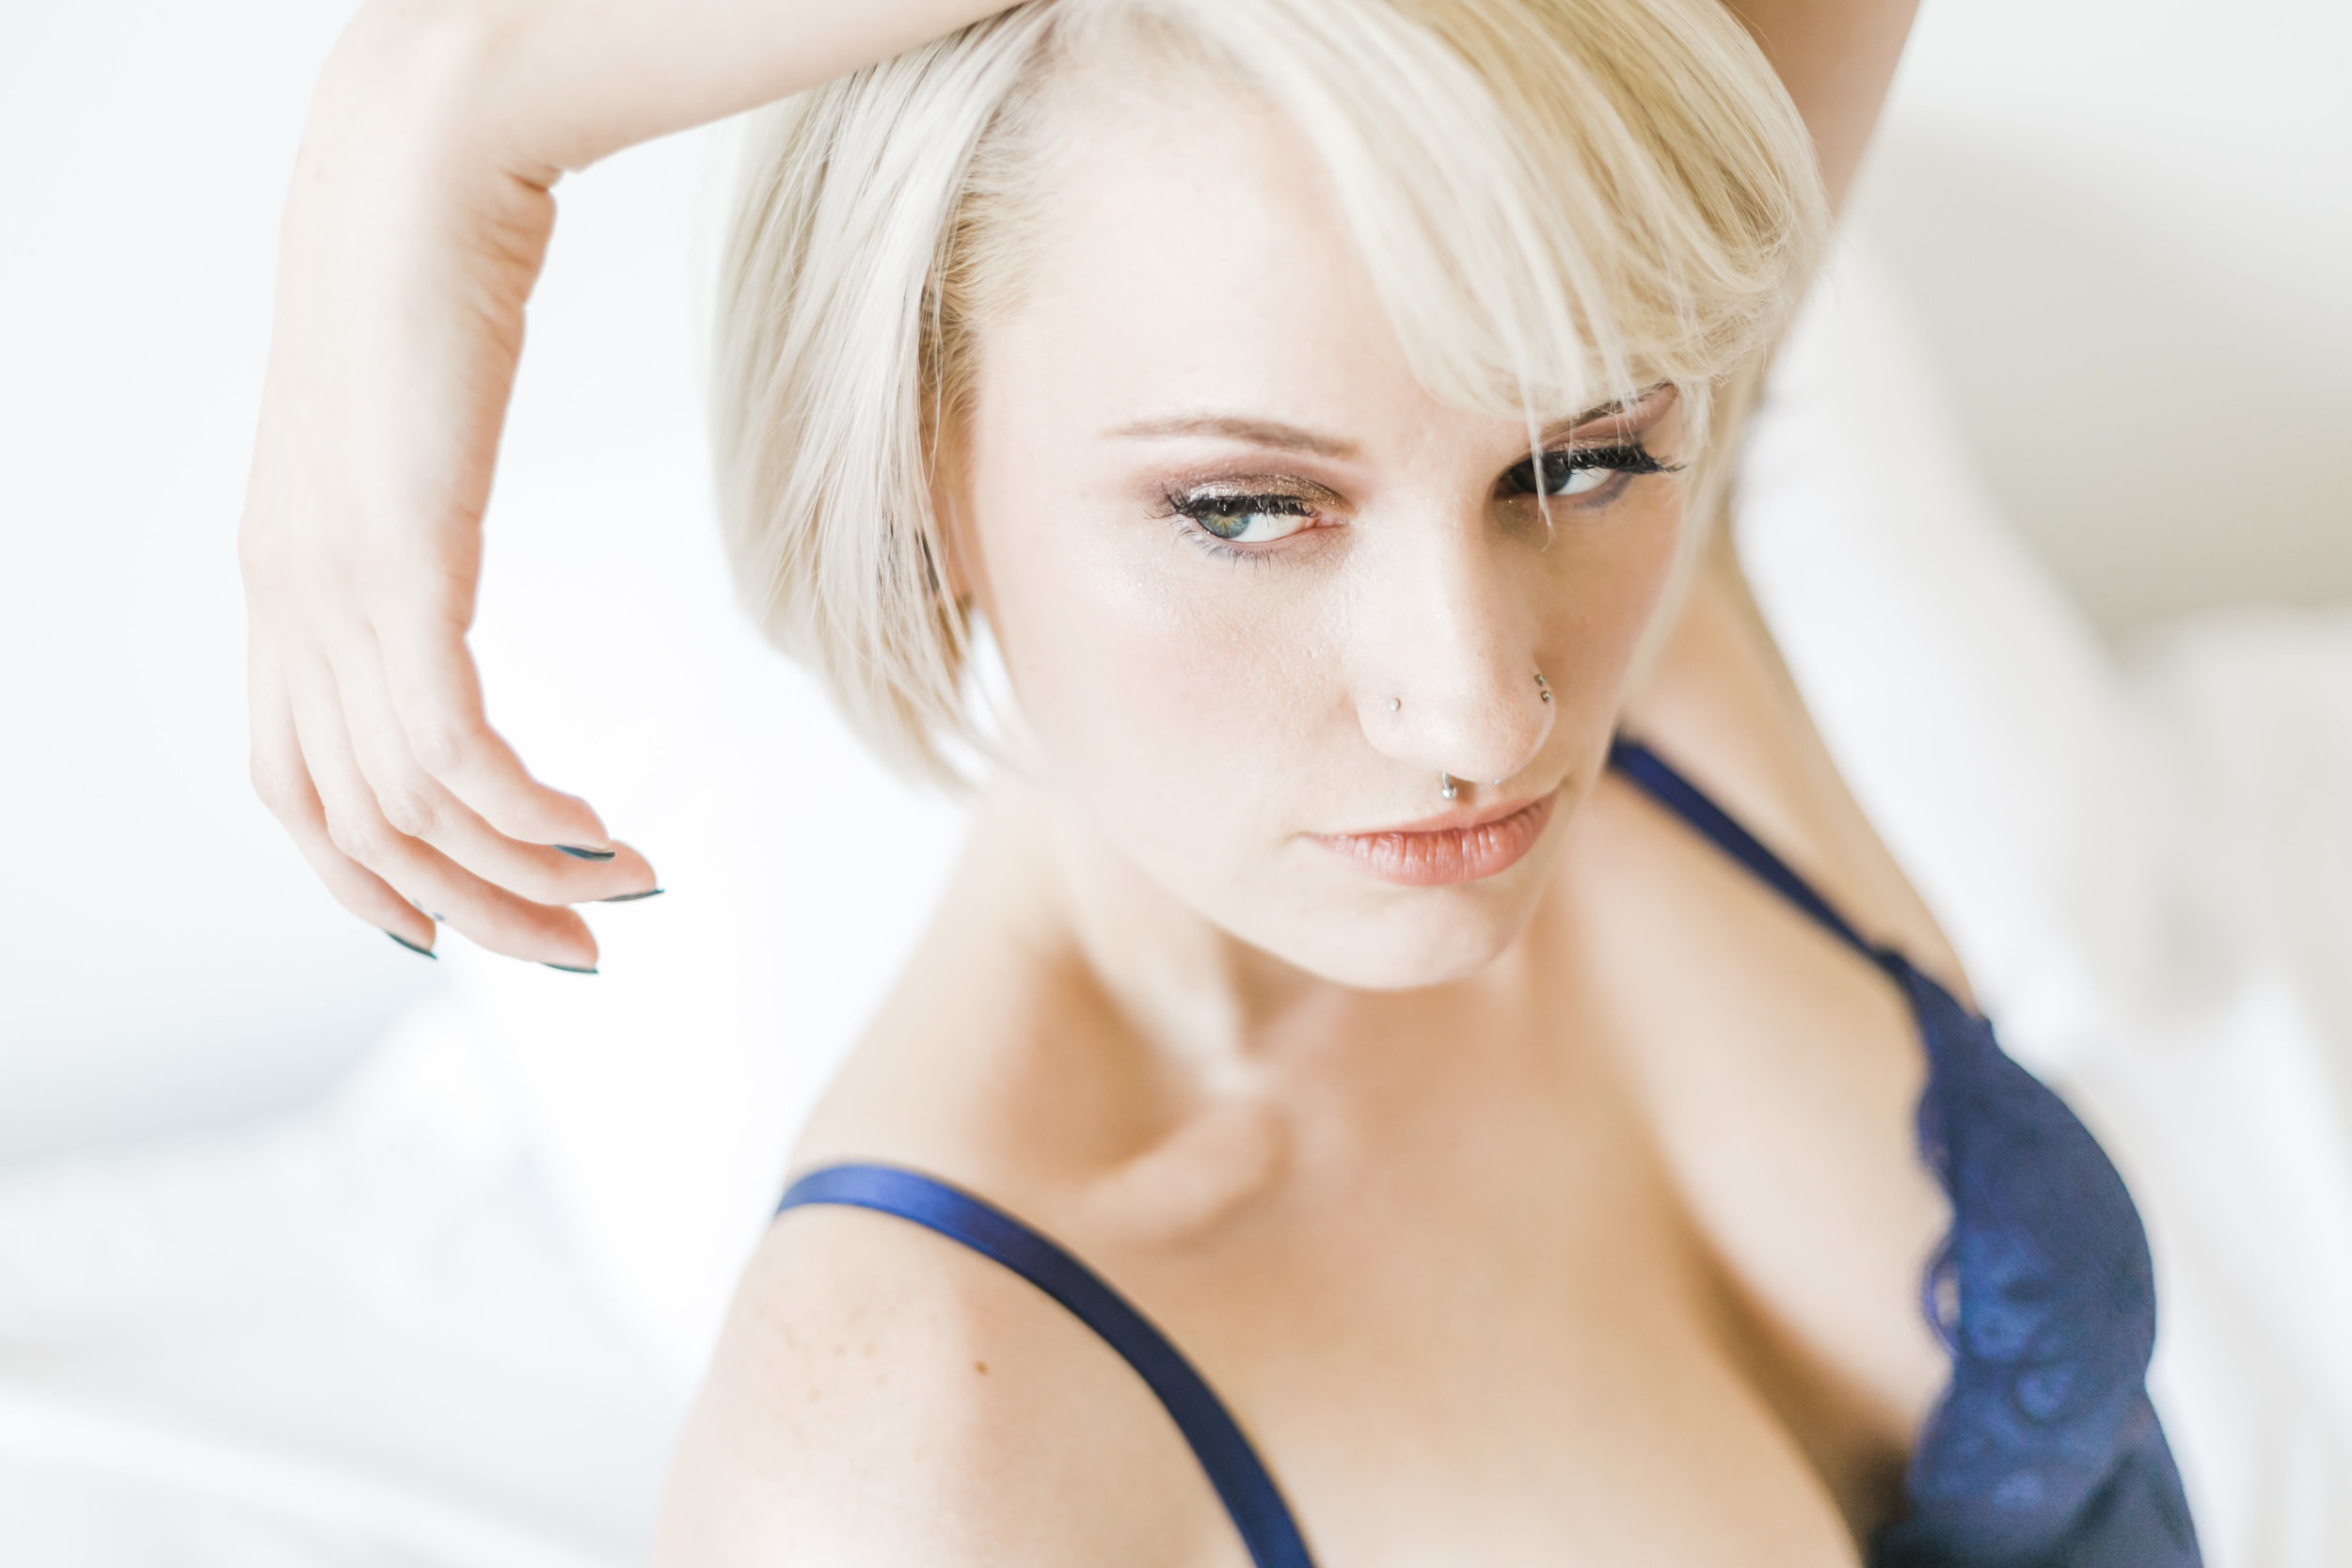 knoxville boudoir photographer winx photo